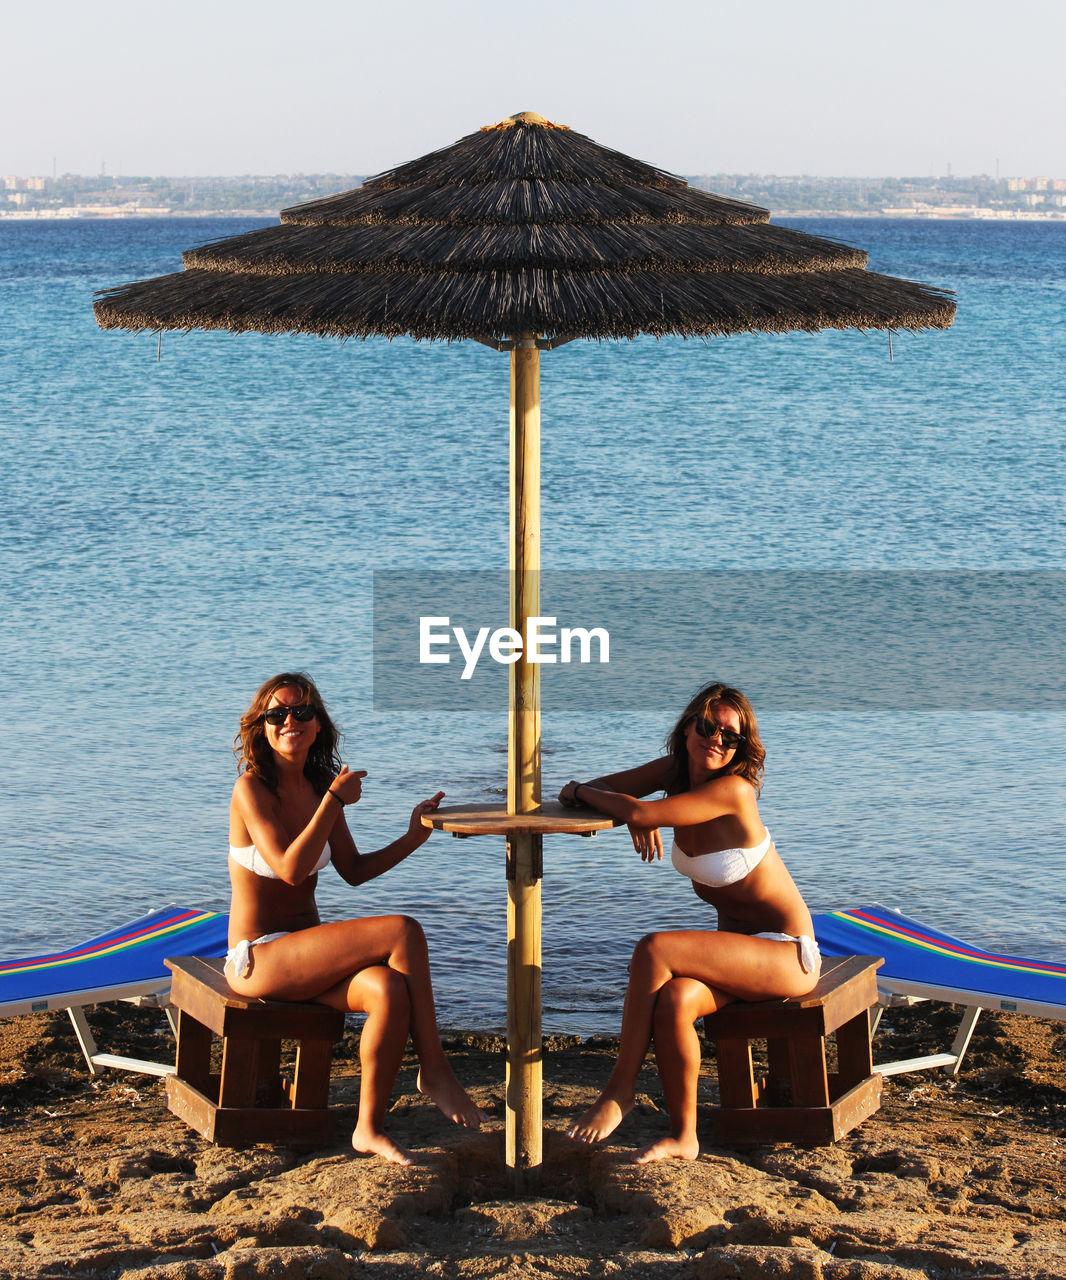 Multiple Image Of Woman Wearing Bikini While Sitting On Rocky Shore